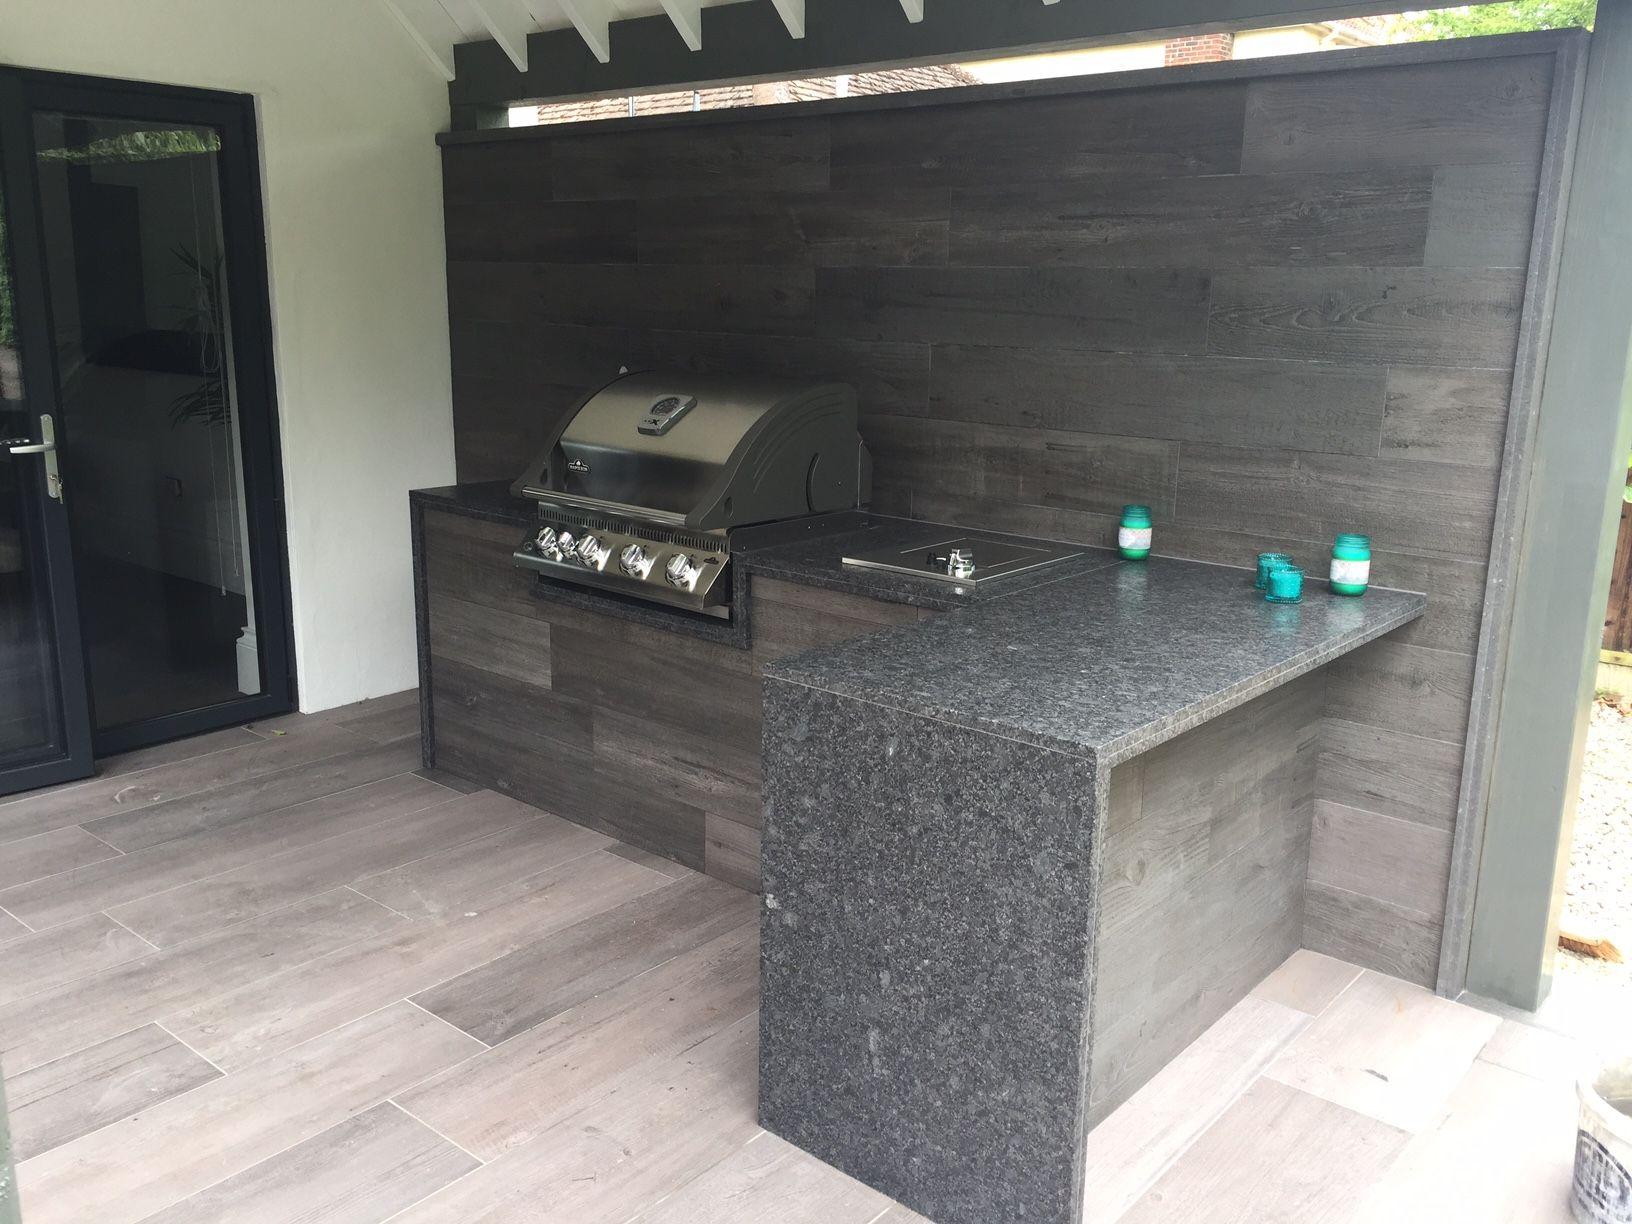 outdoor kitchen created using valverdi wood effect porcelain tiles